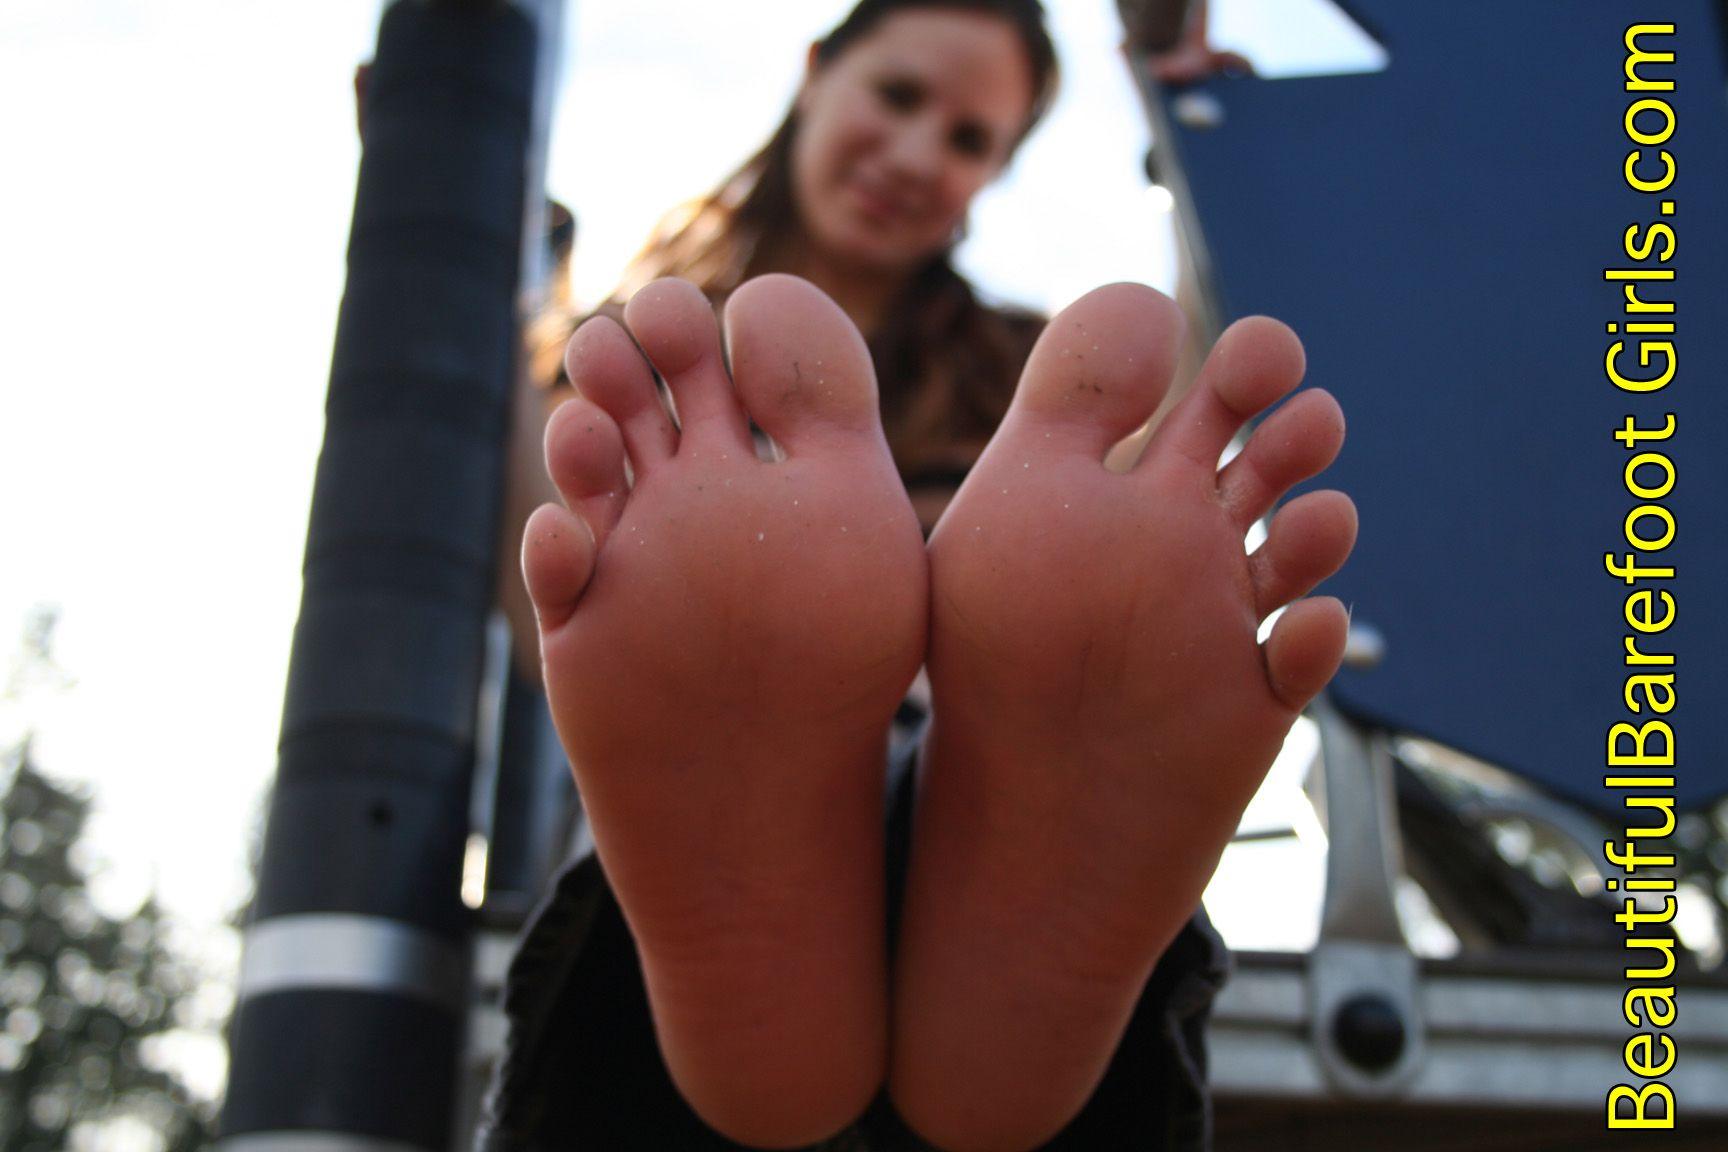 Foot fetish famous-2525